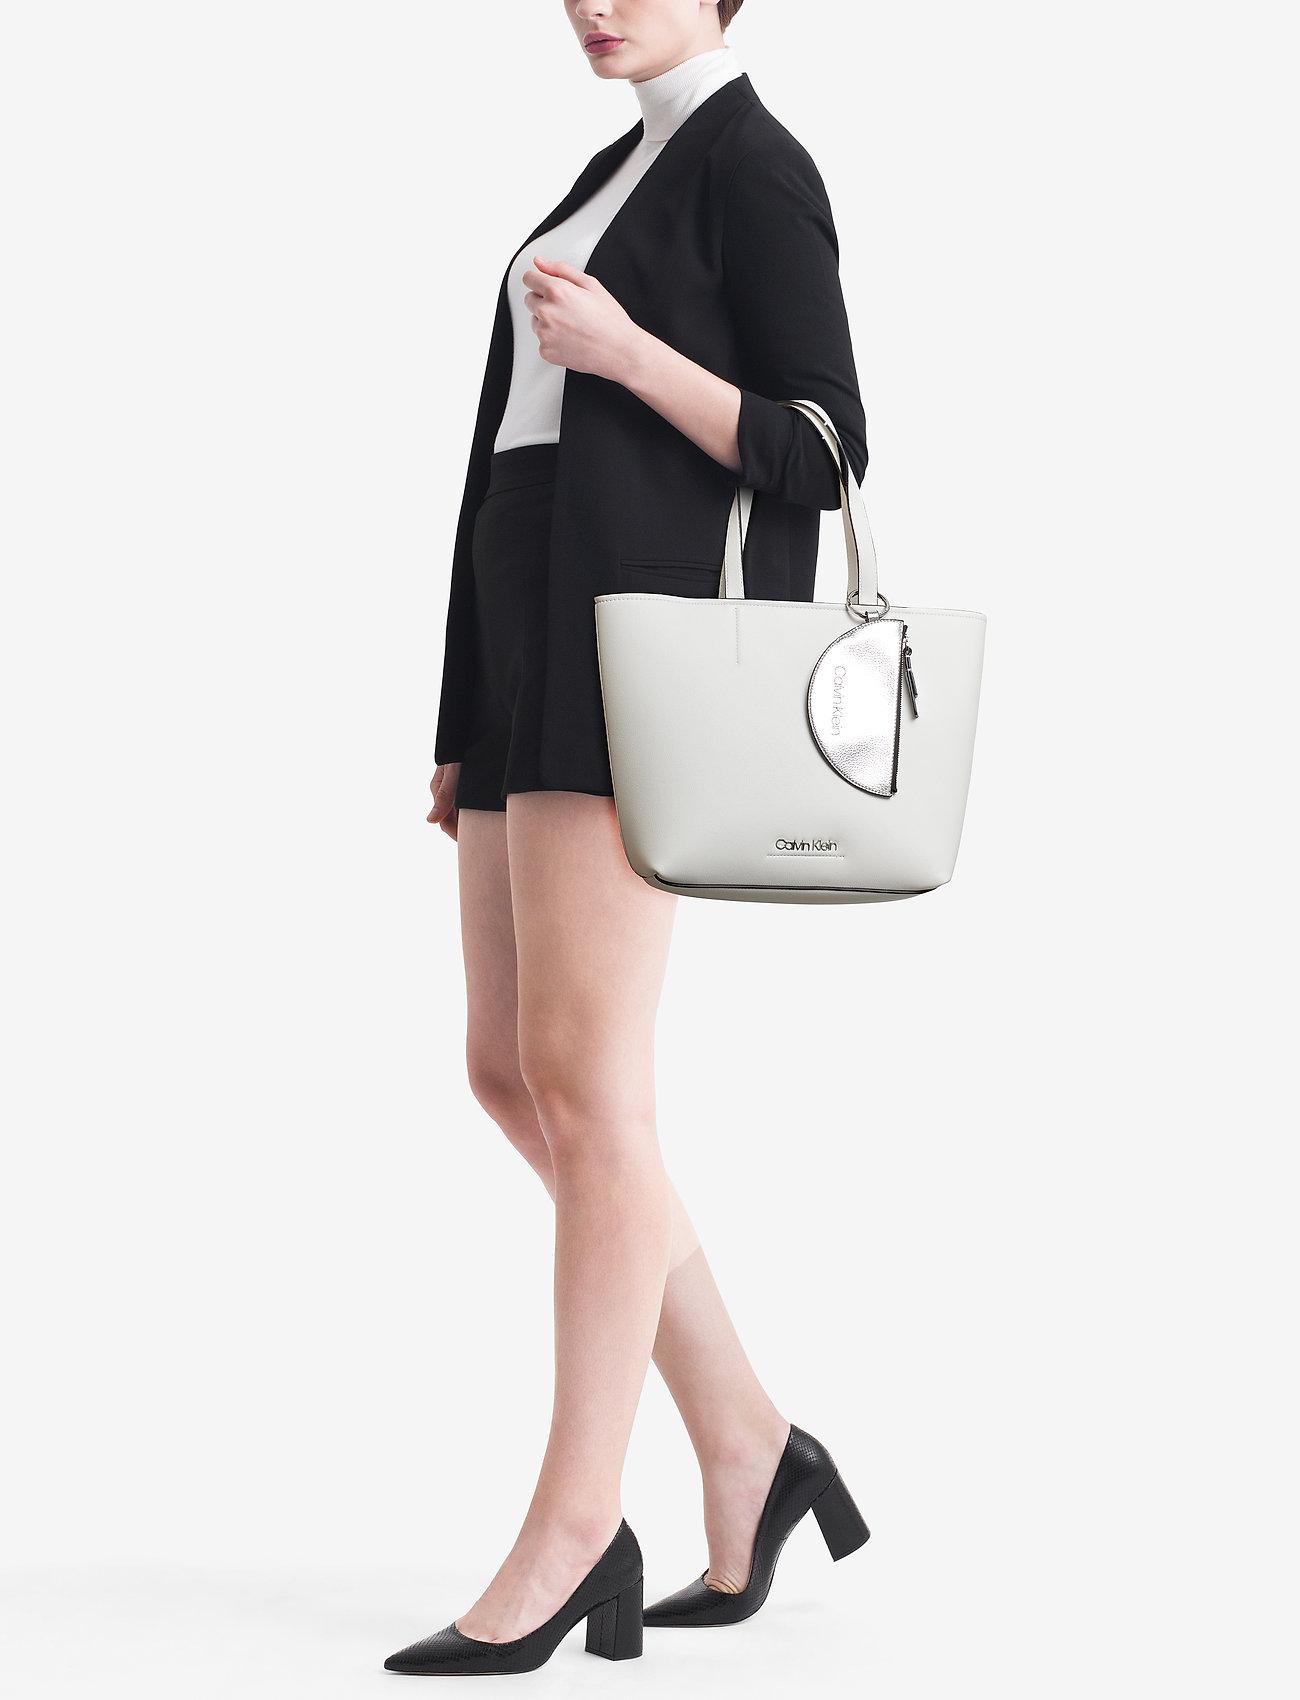 Calvin Klein CK MUST MEDIUM SHOPP - BRIGHT WHITE